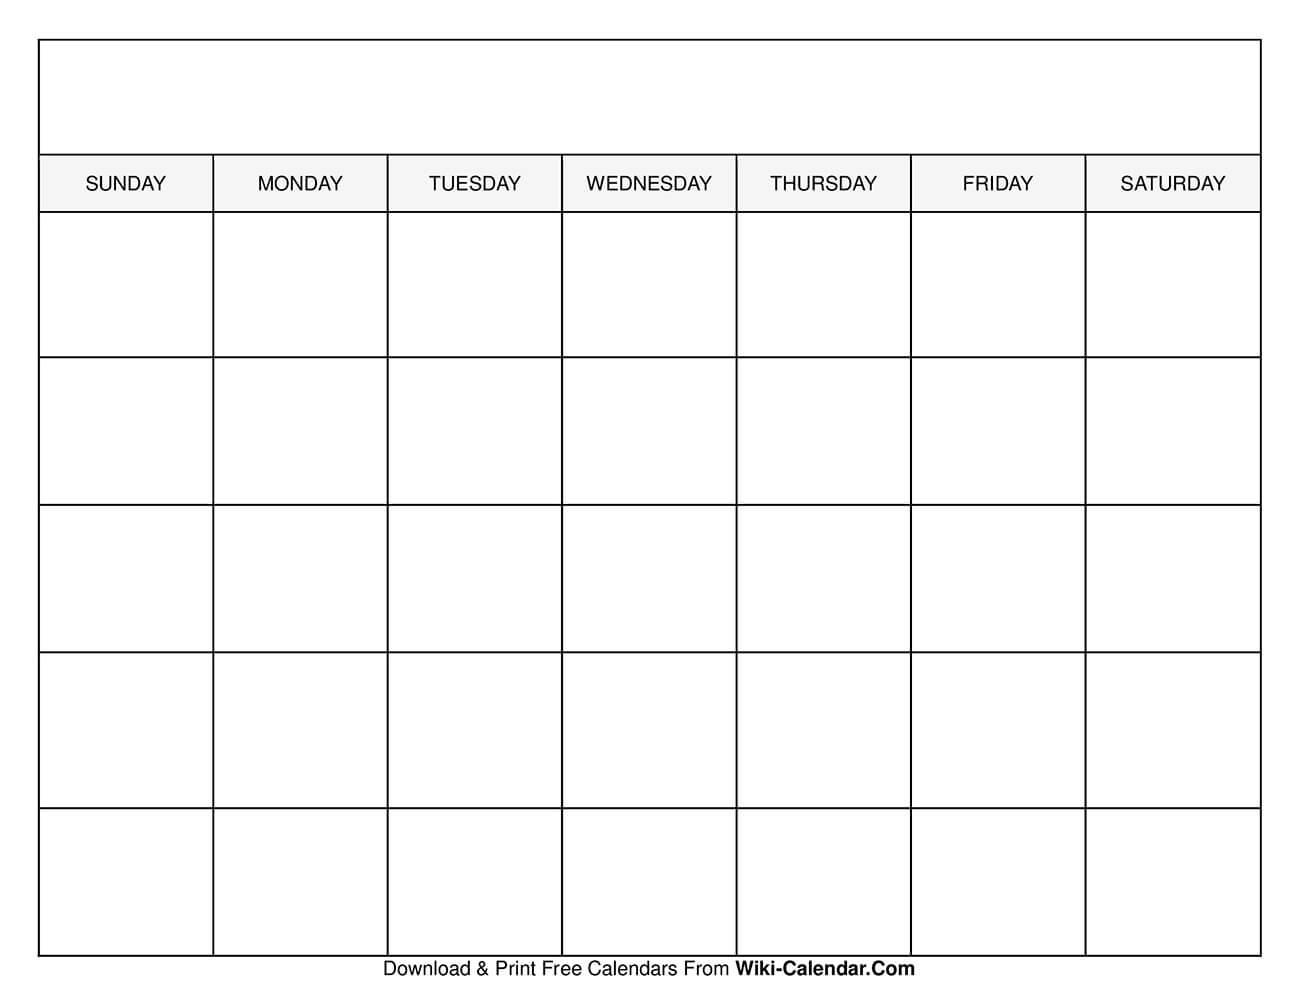 Printable Blank Calendar Templates-Sundat To Saturday Printable Monthly Blank Calendar